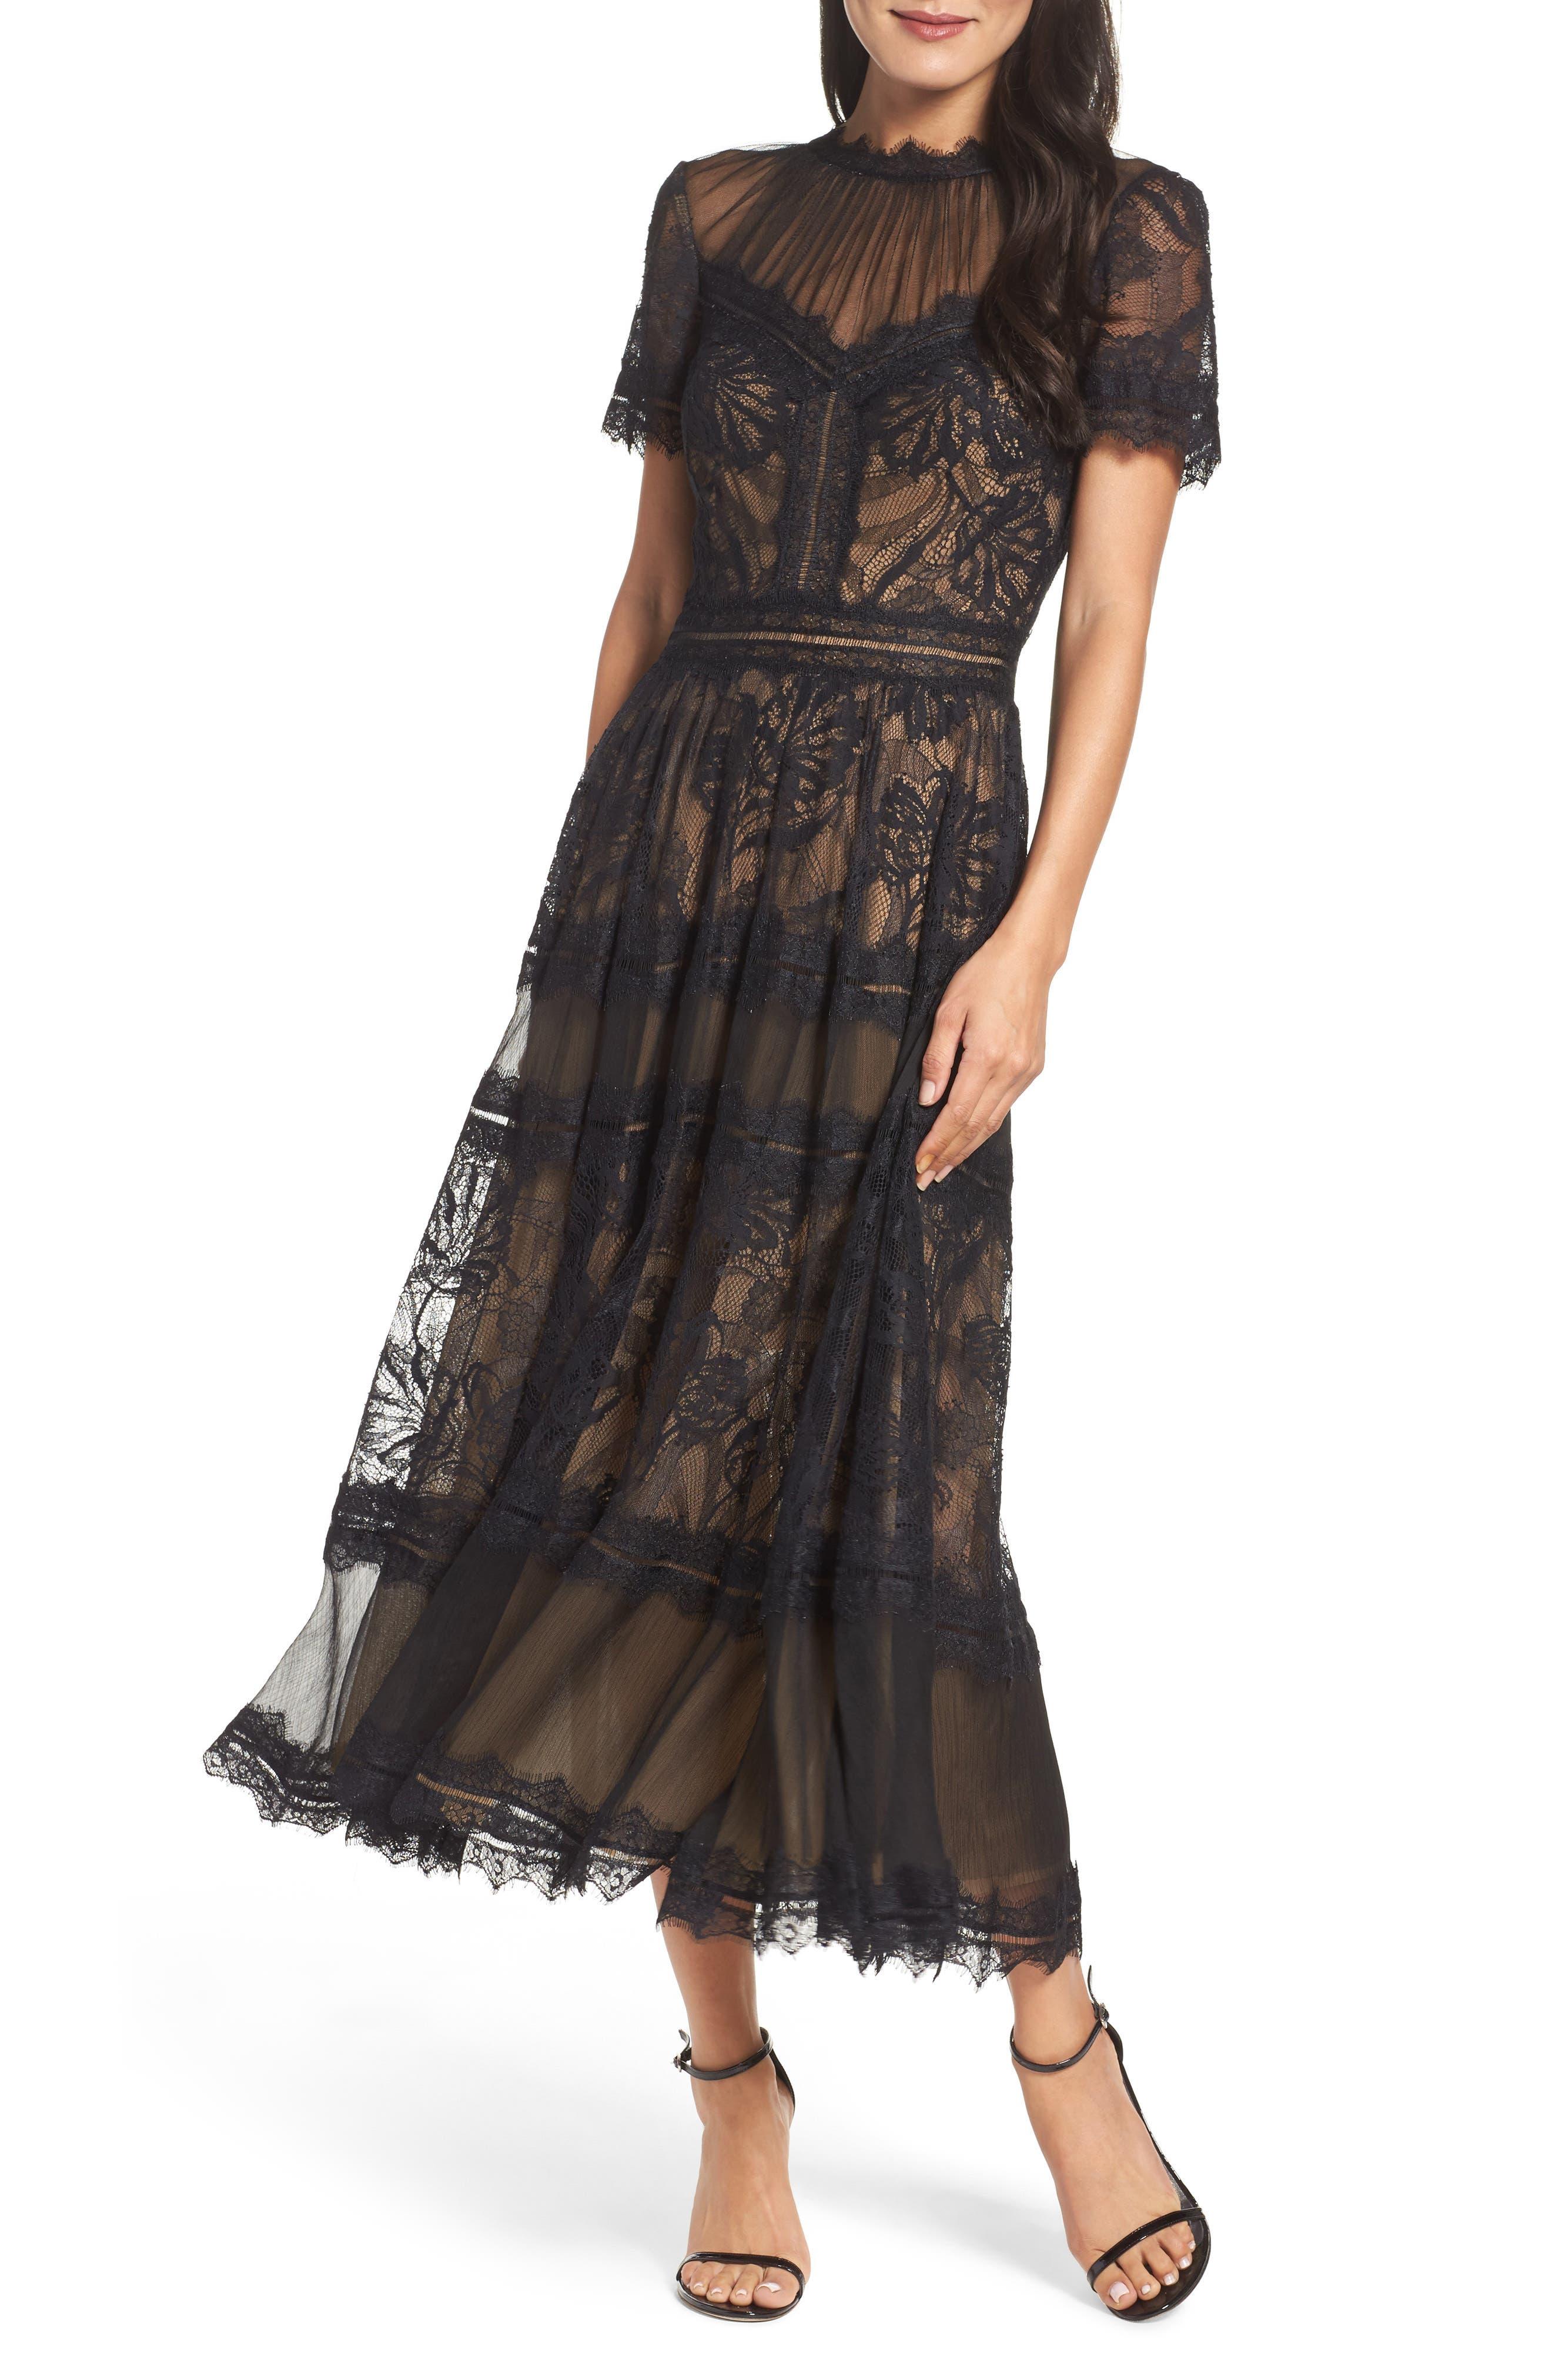 1960s Dresses | 60s Dresses Mod, Mini, Jackie O, Hippie Womens Tadashi Shoji Lace Midi Dress Size 10 - Black $378.00 AT vintagedancer.com